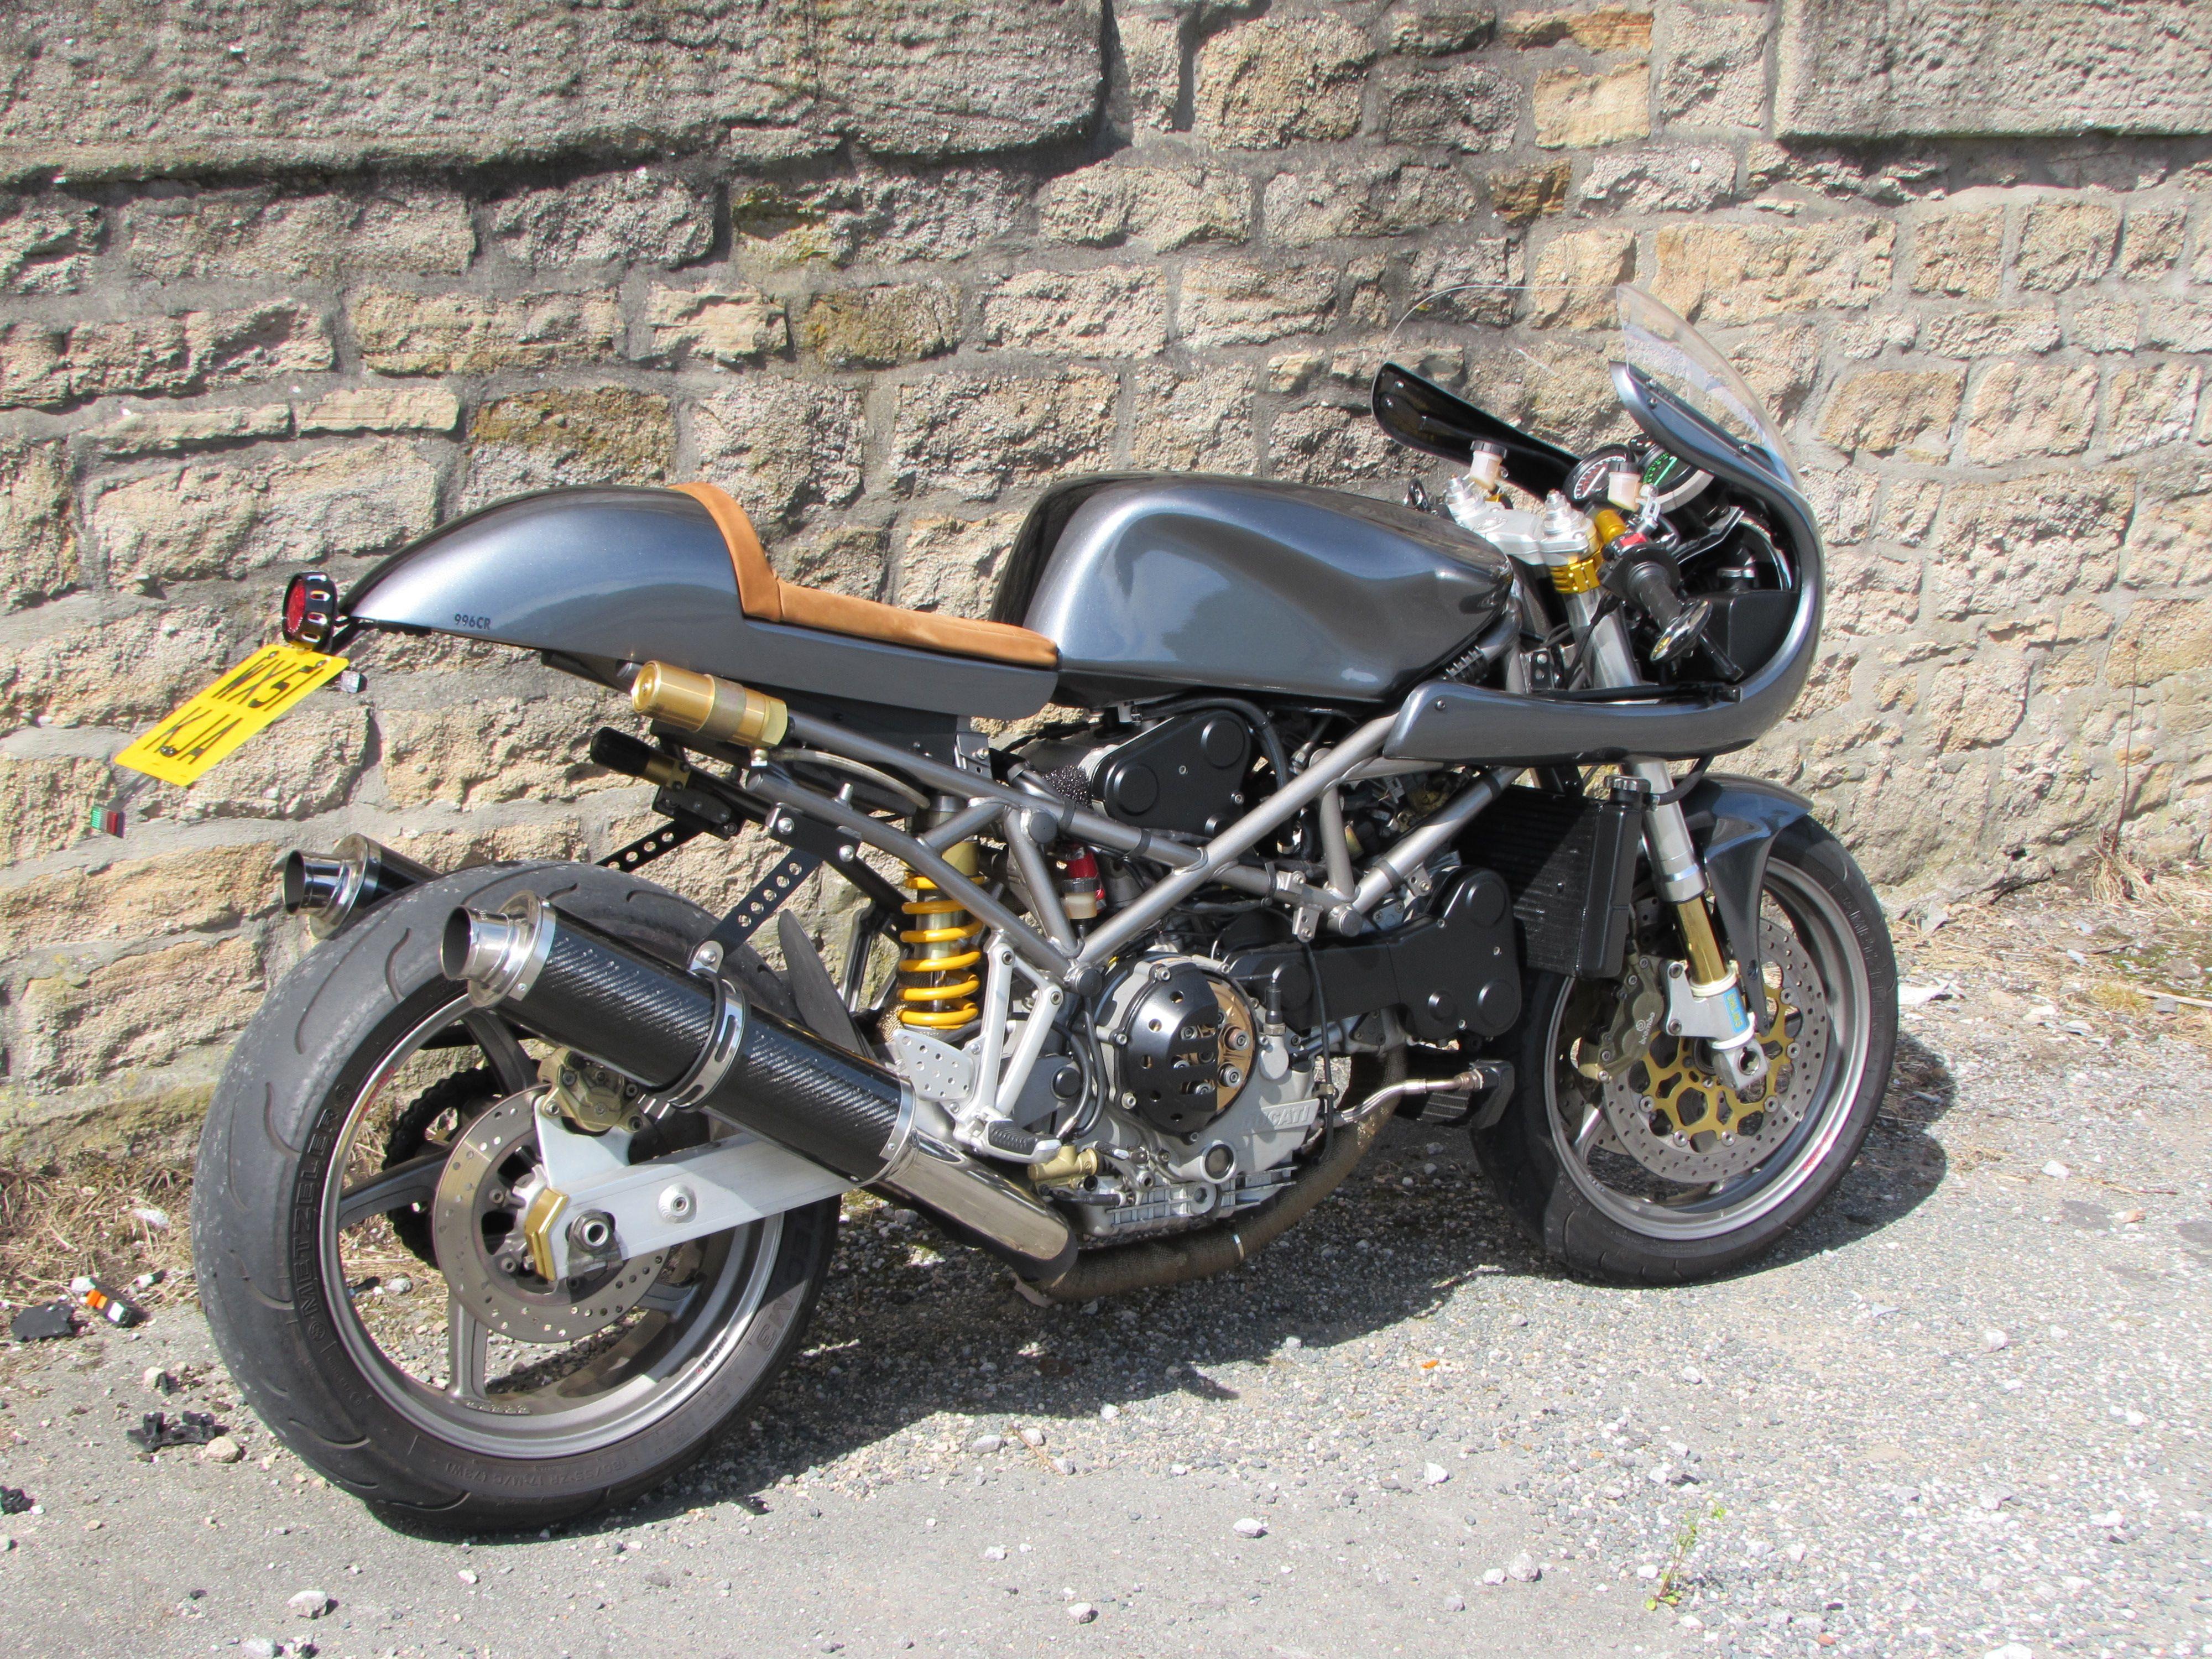 Merveilleux Ducati ST4s Cafe Racer Backyardrider.com